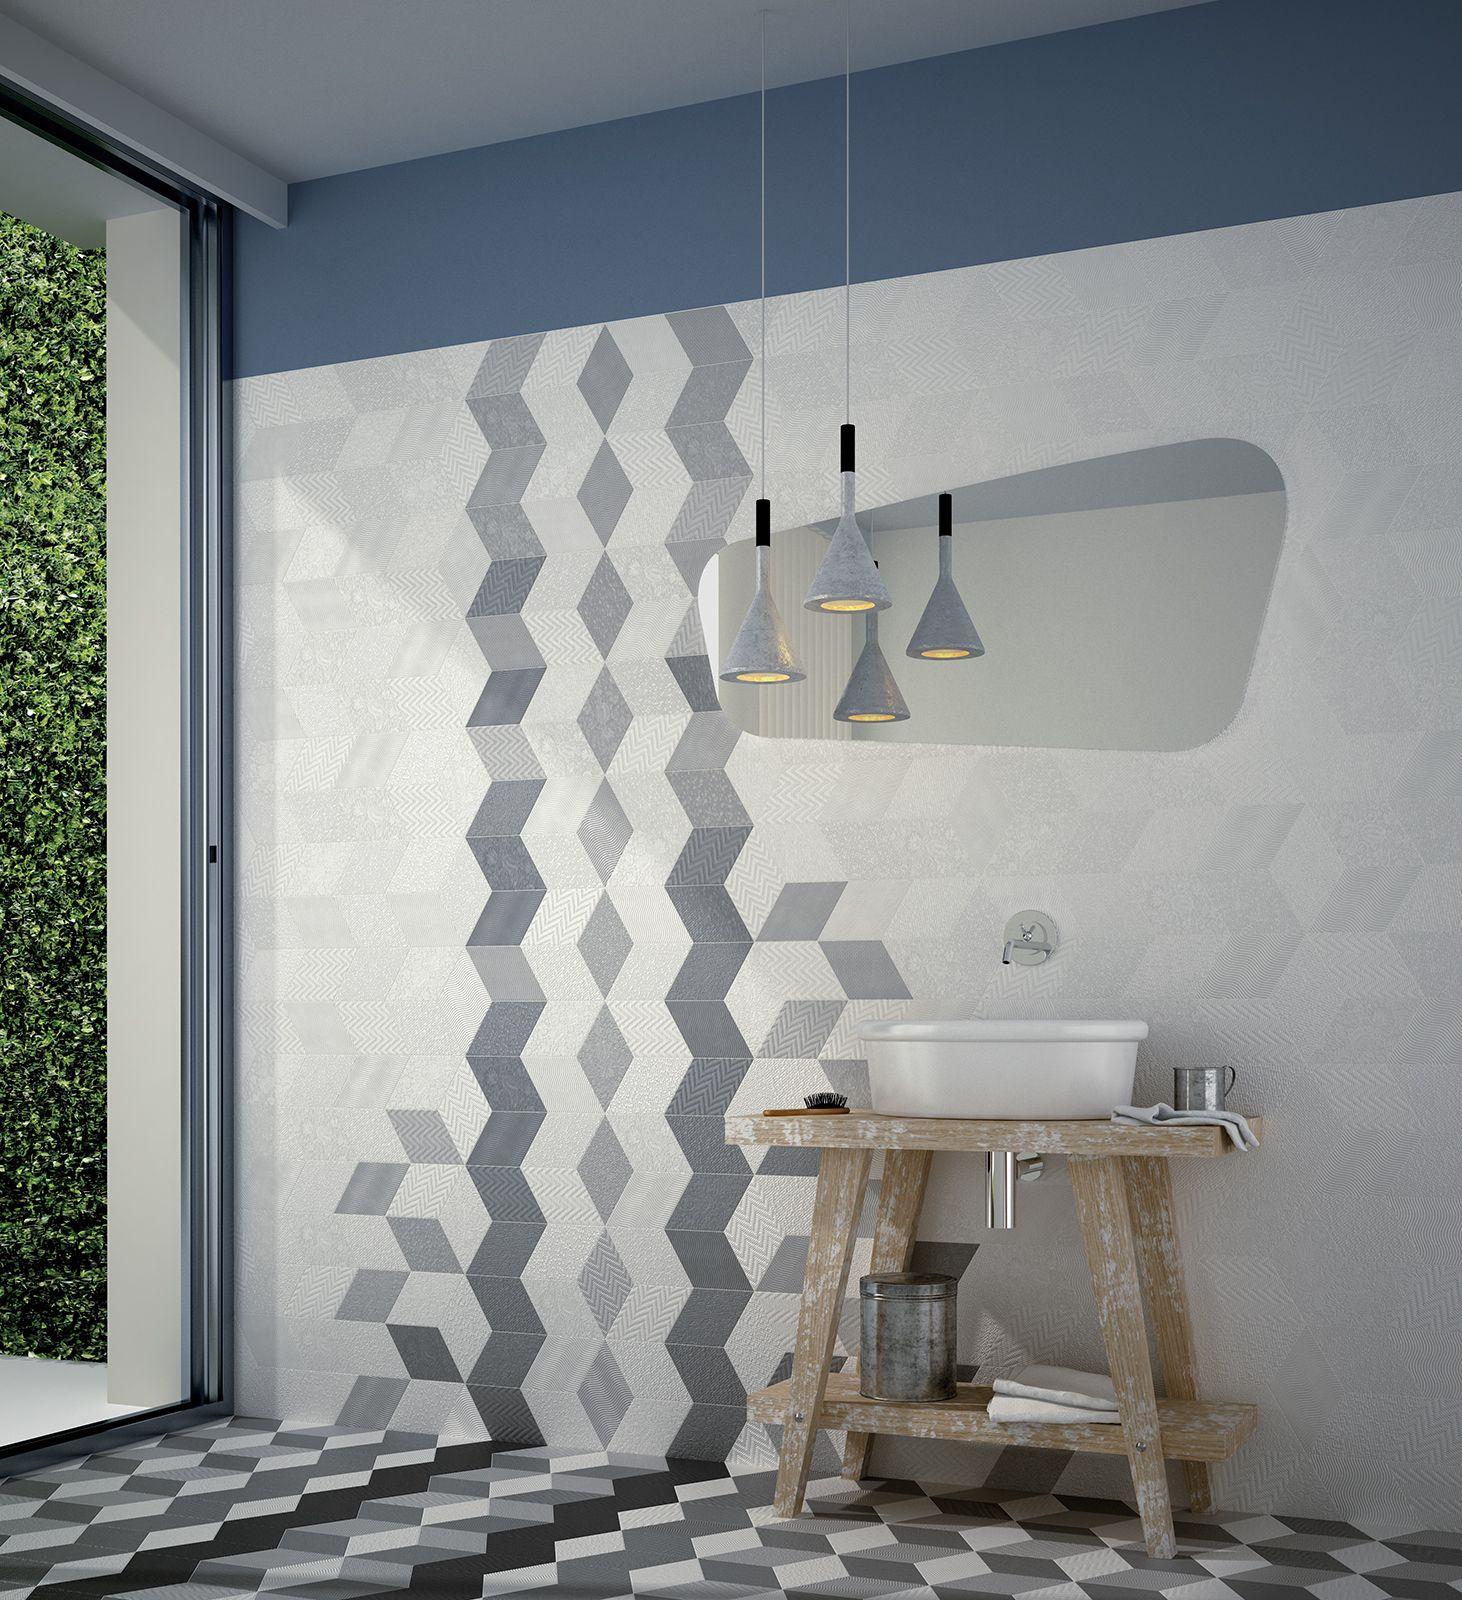 rhombus white, rhombus grey, rhombus black nais.es | Łazienka